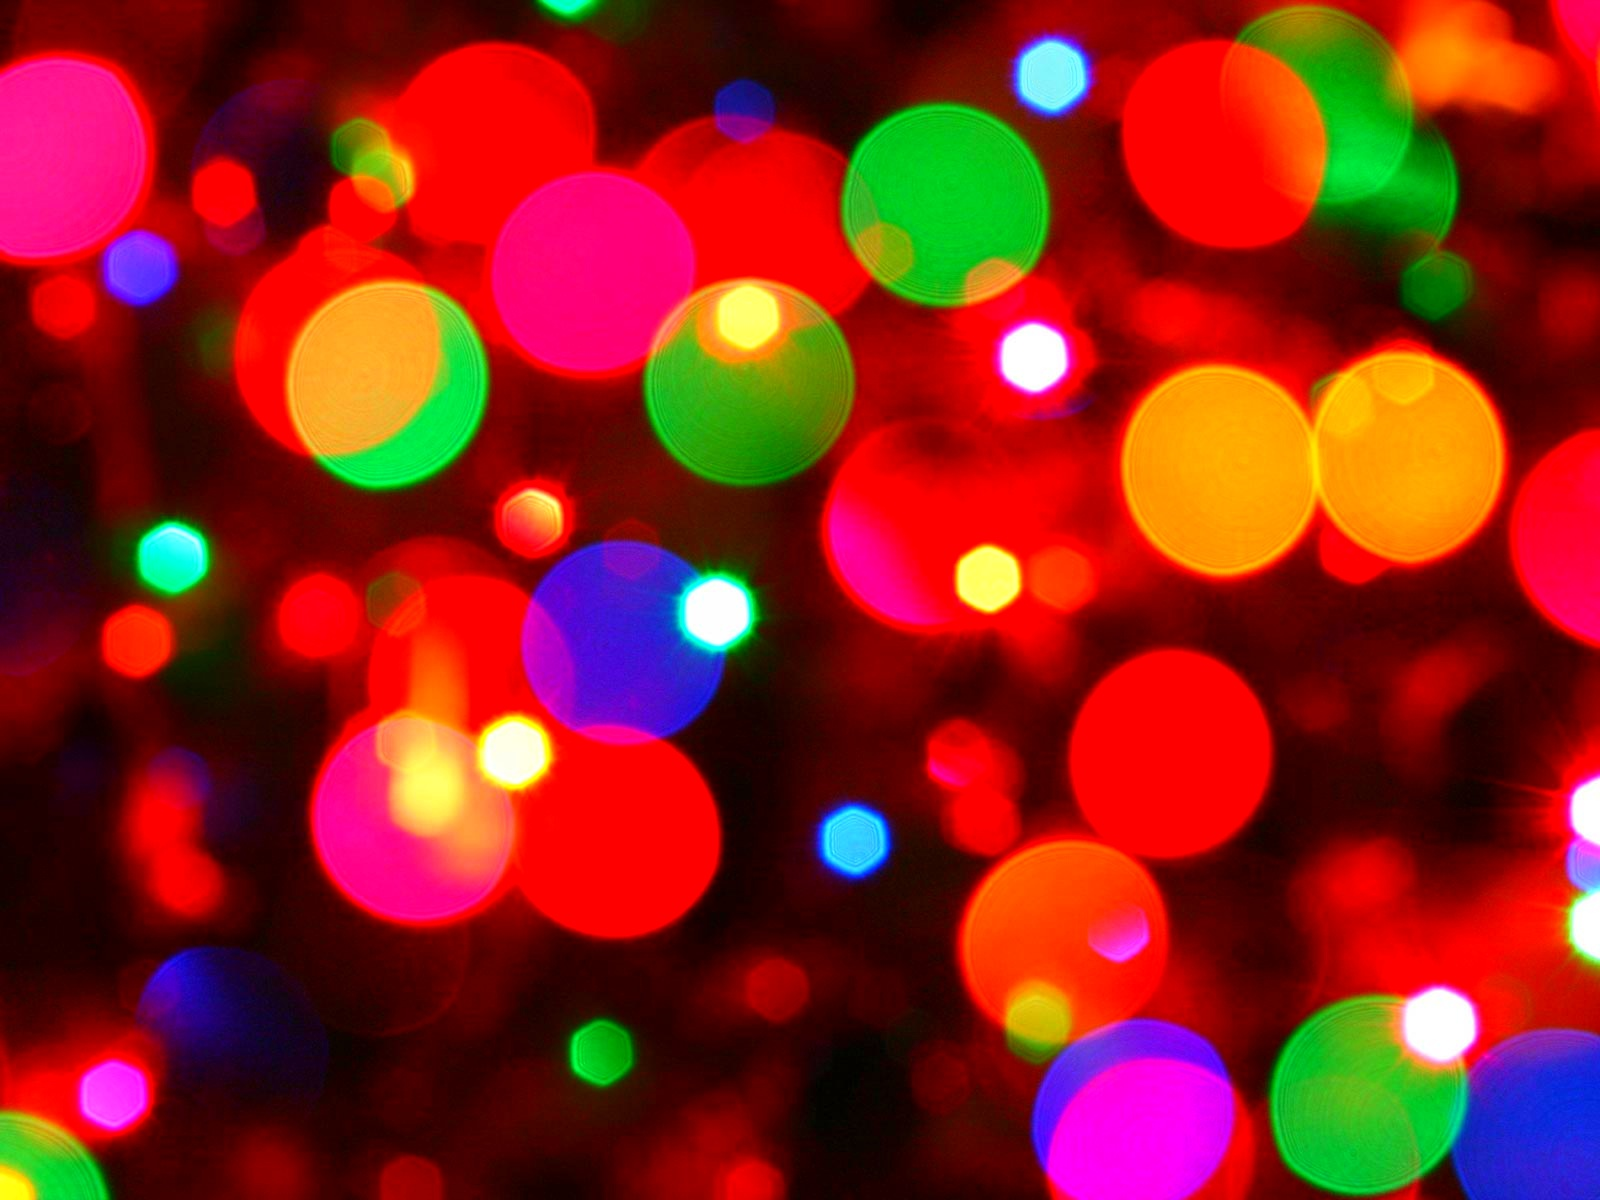 Lights Christmas Bokeh Wallpaper